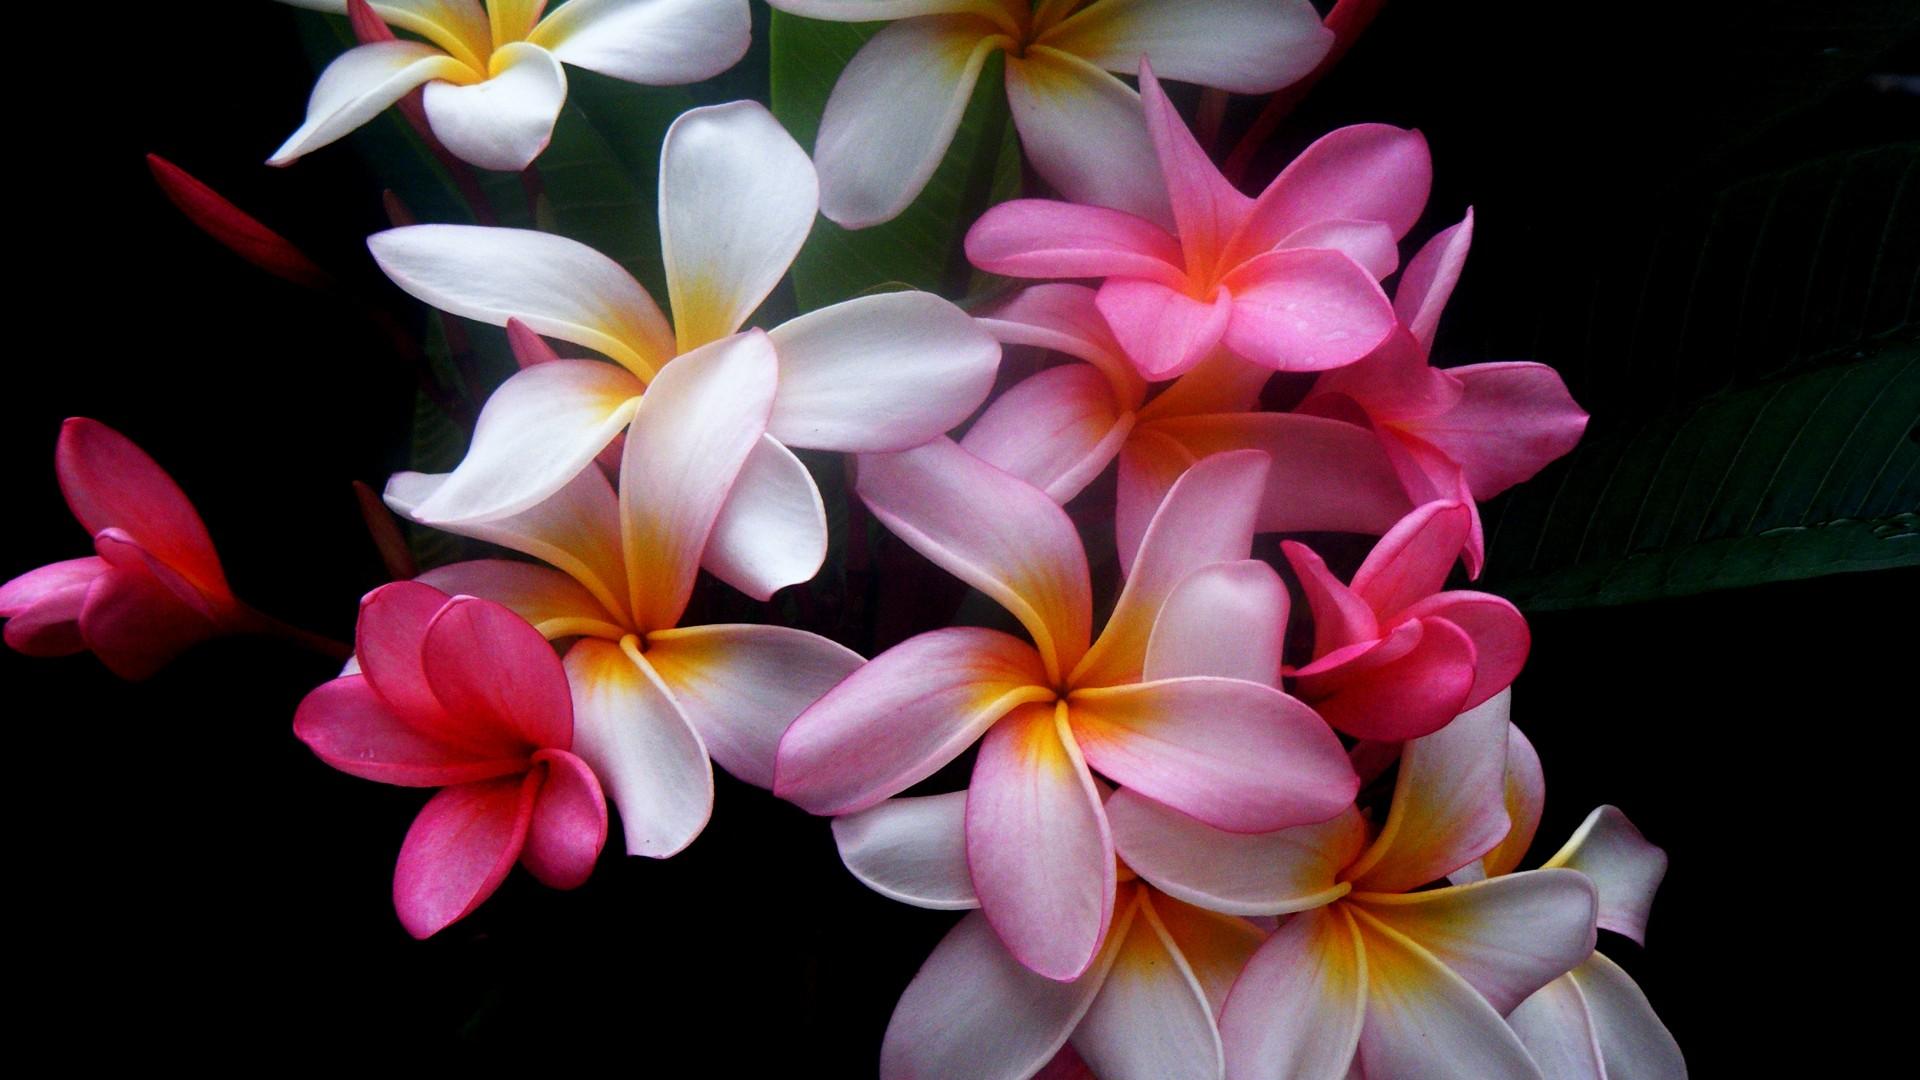 beautiful flowers wallpapers 27664 1920x1080jpg 1920x1080